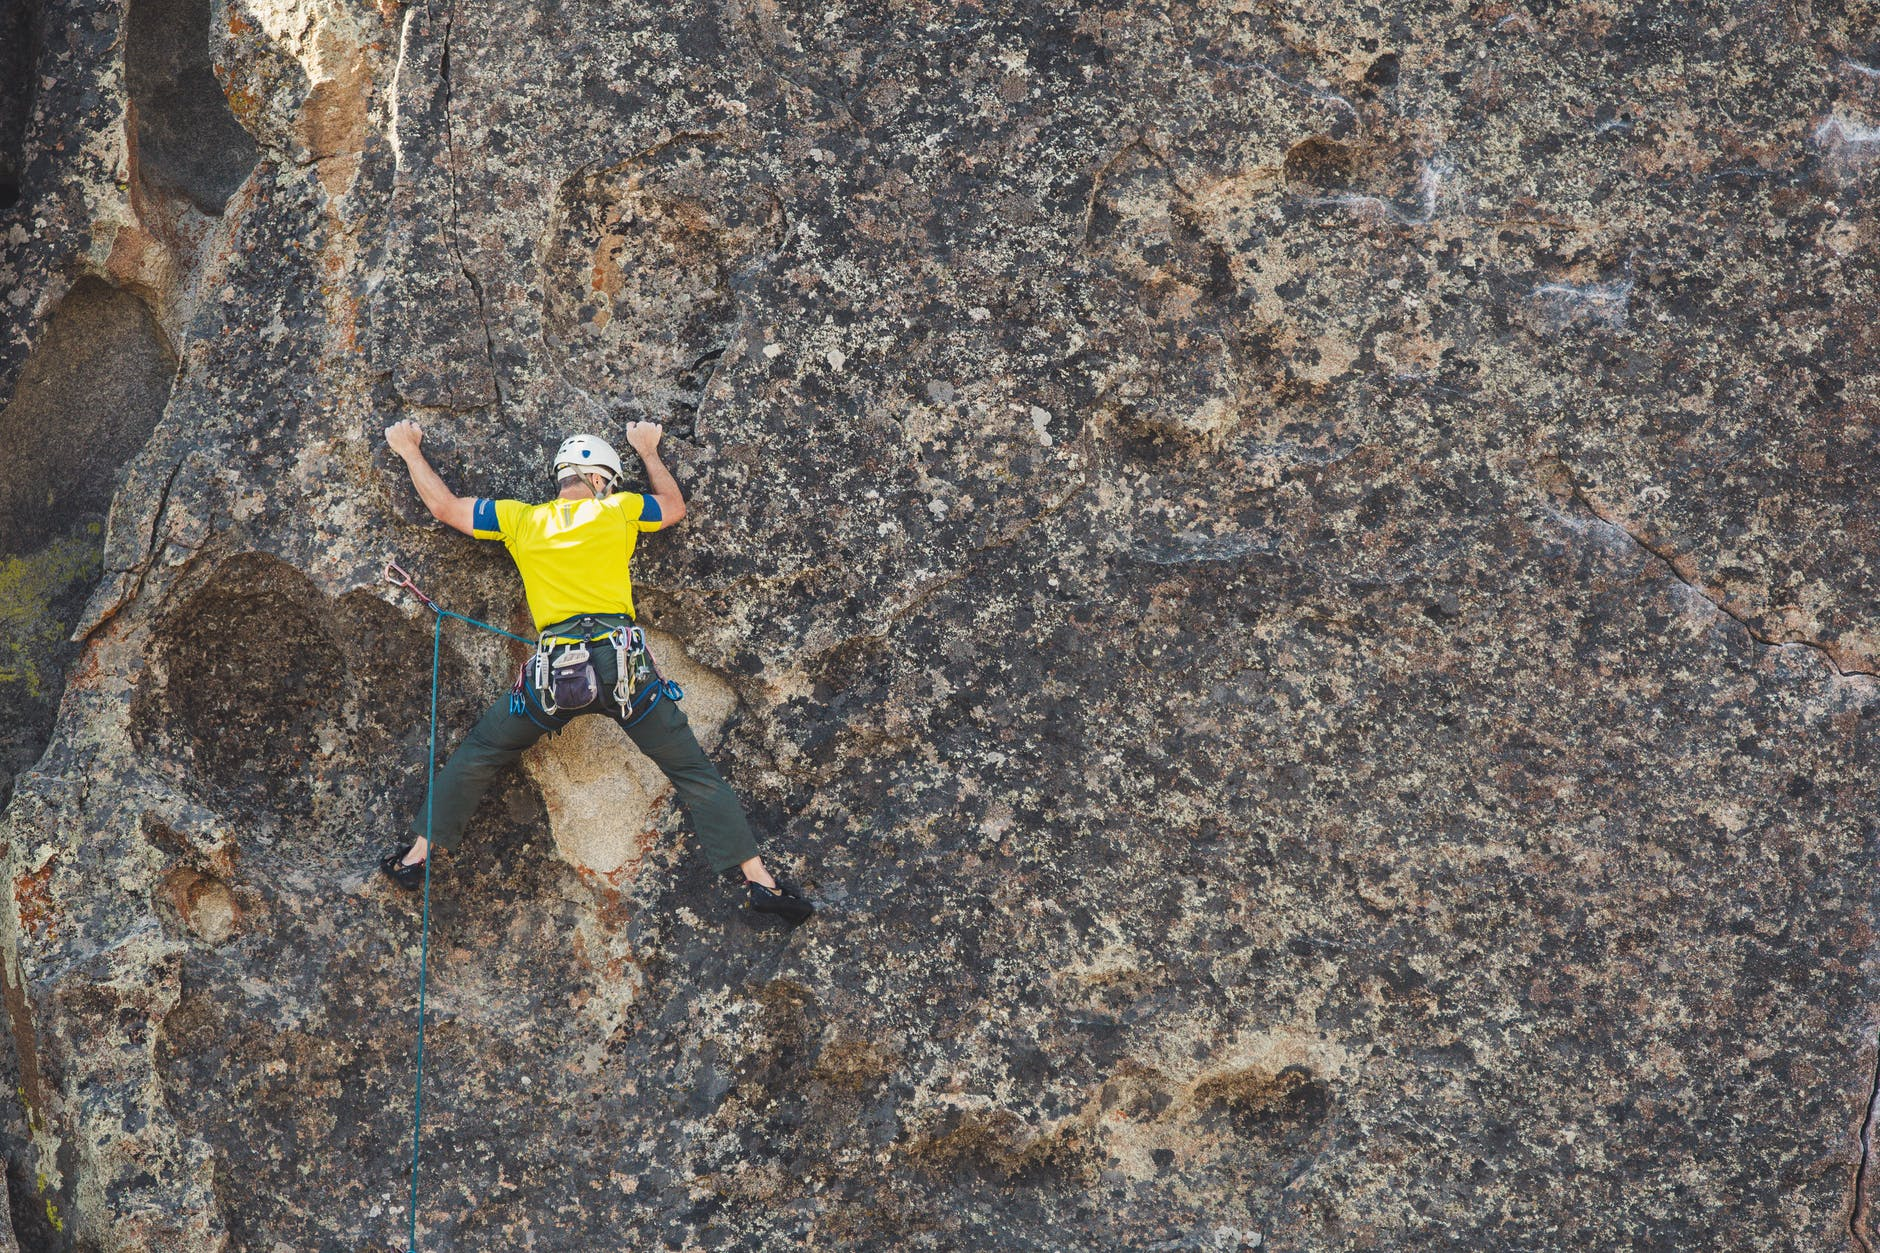 Rock Climbing Guide for Beginners